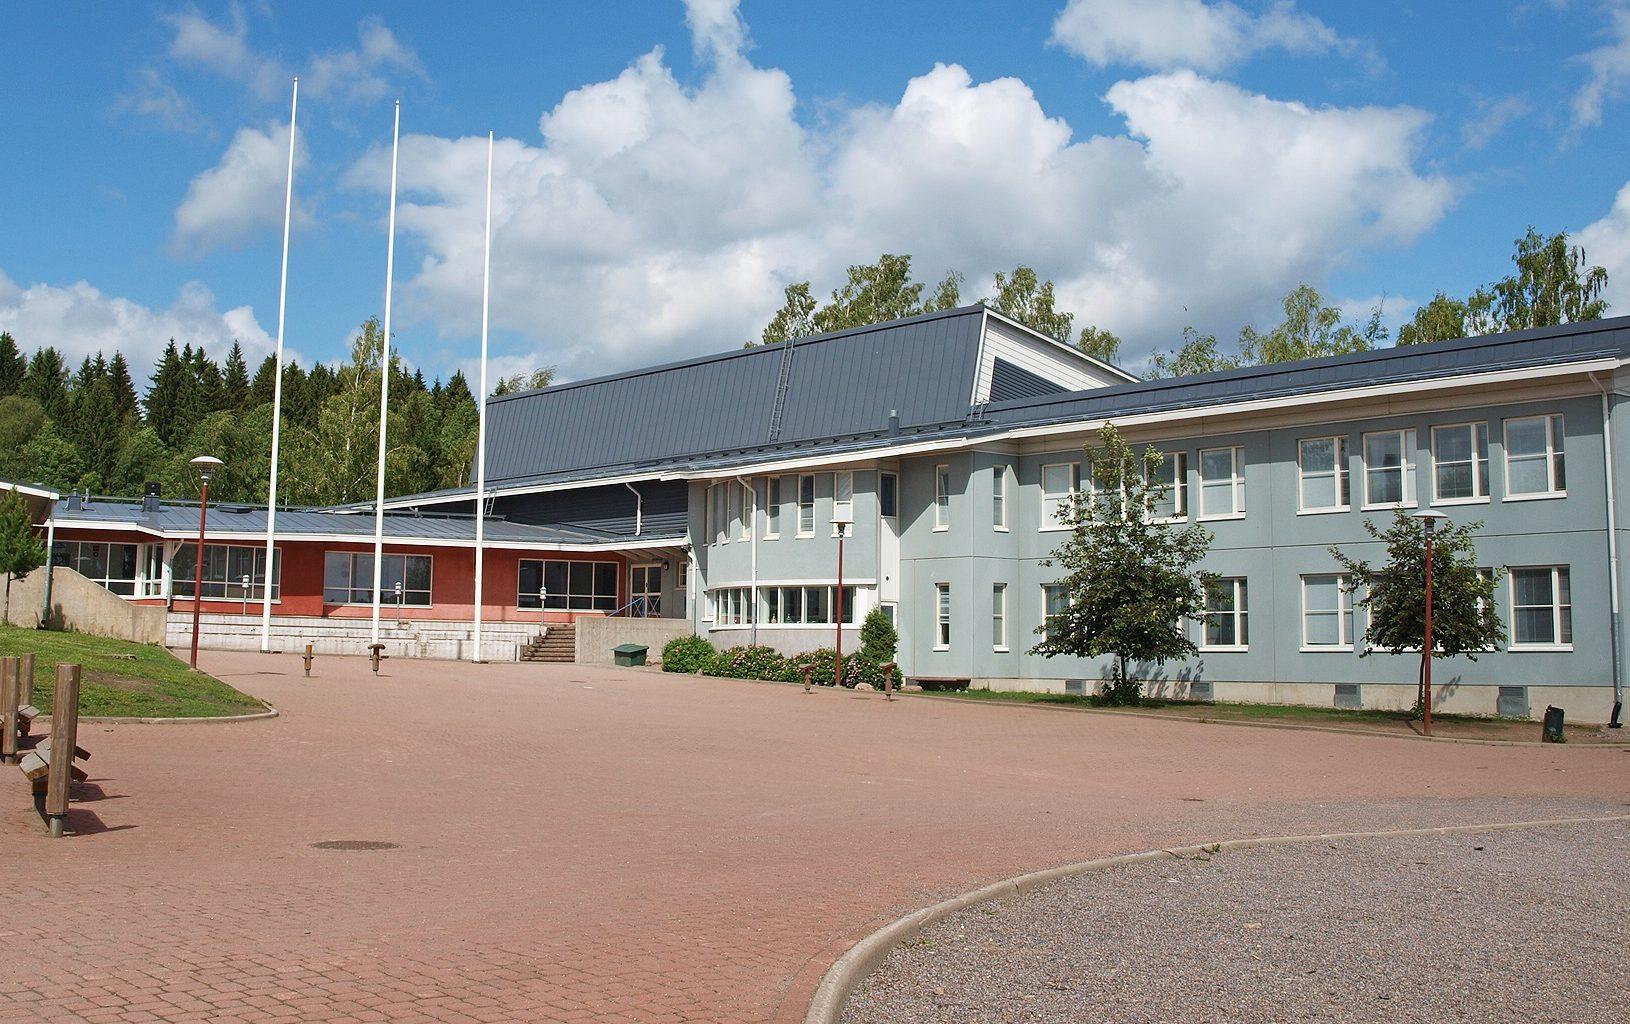 Ojakkalan Koulu